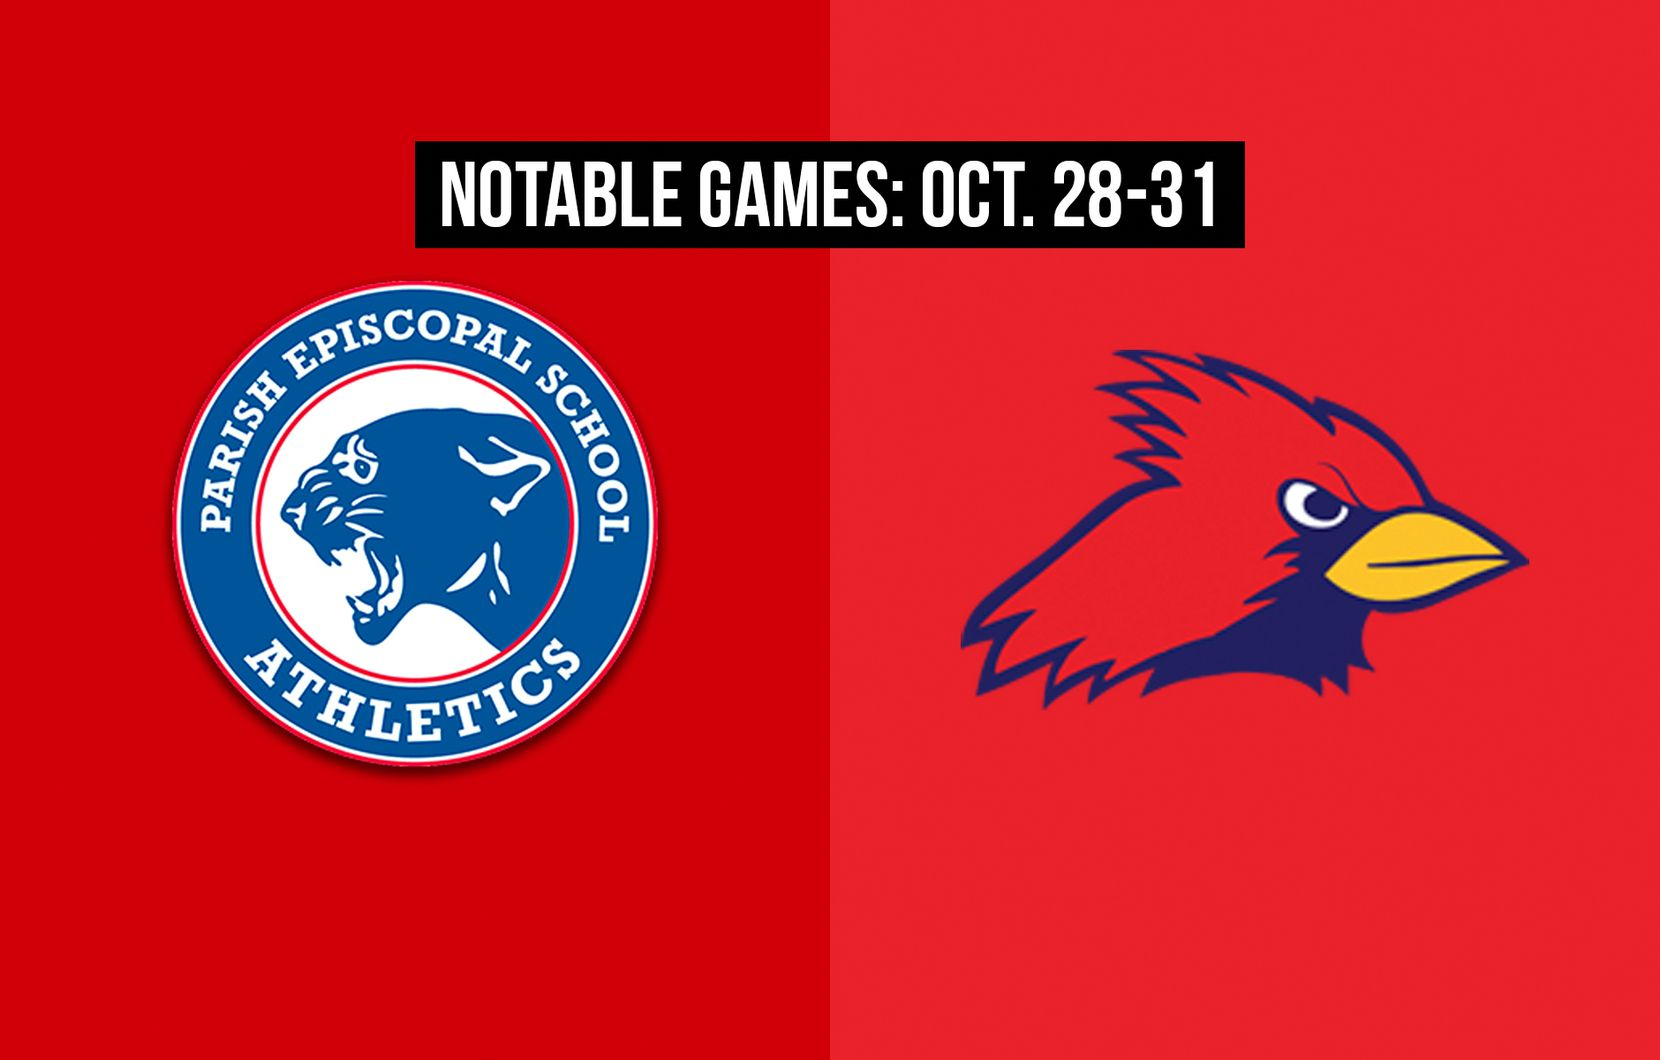 Notable games for the week of Oct. 28-31 of the 2020 season: Parish Episcopal vs. John Paul II.